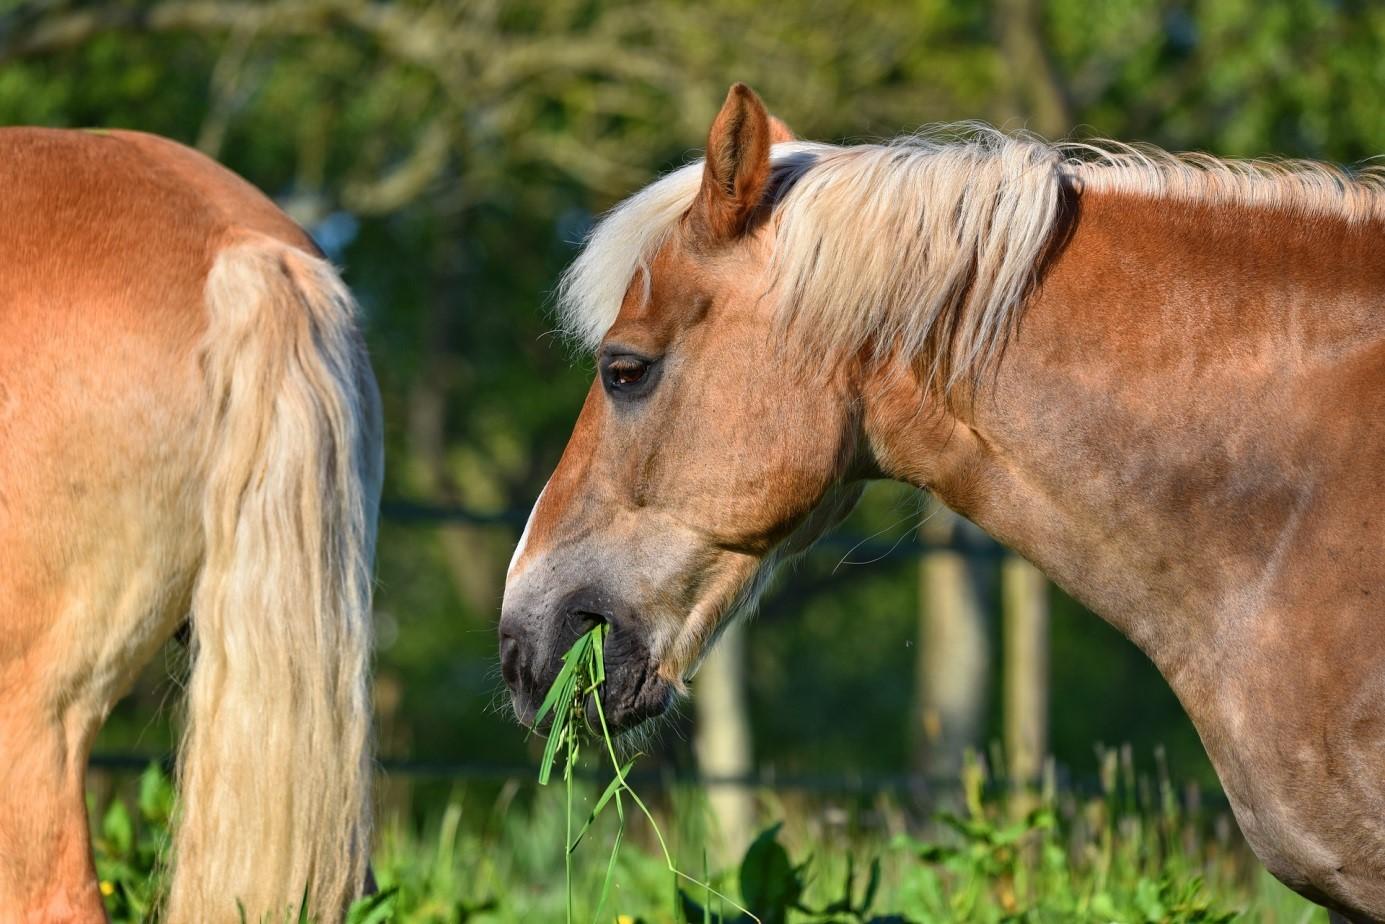 cheval mange herbe